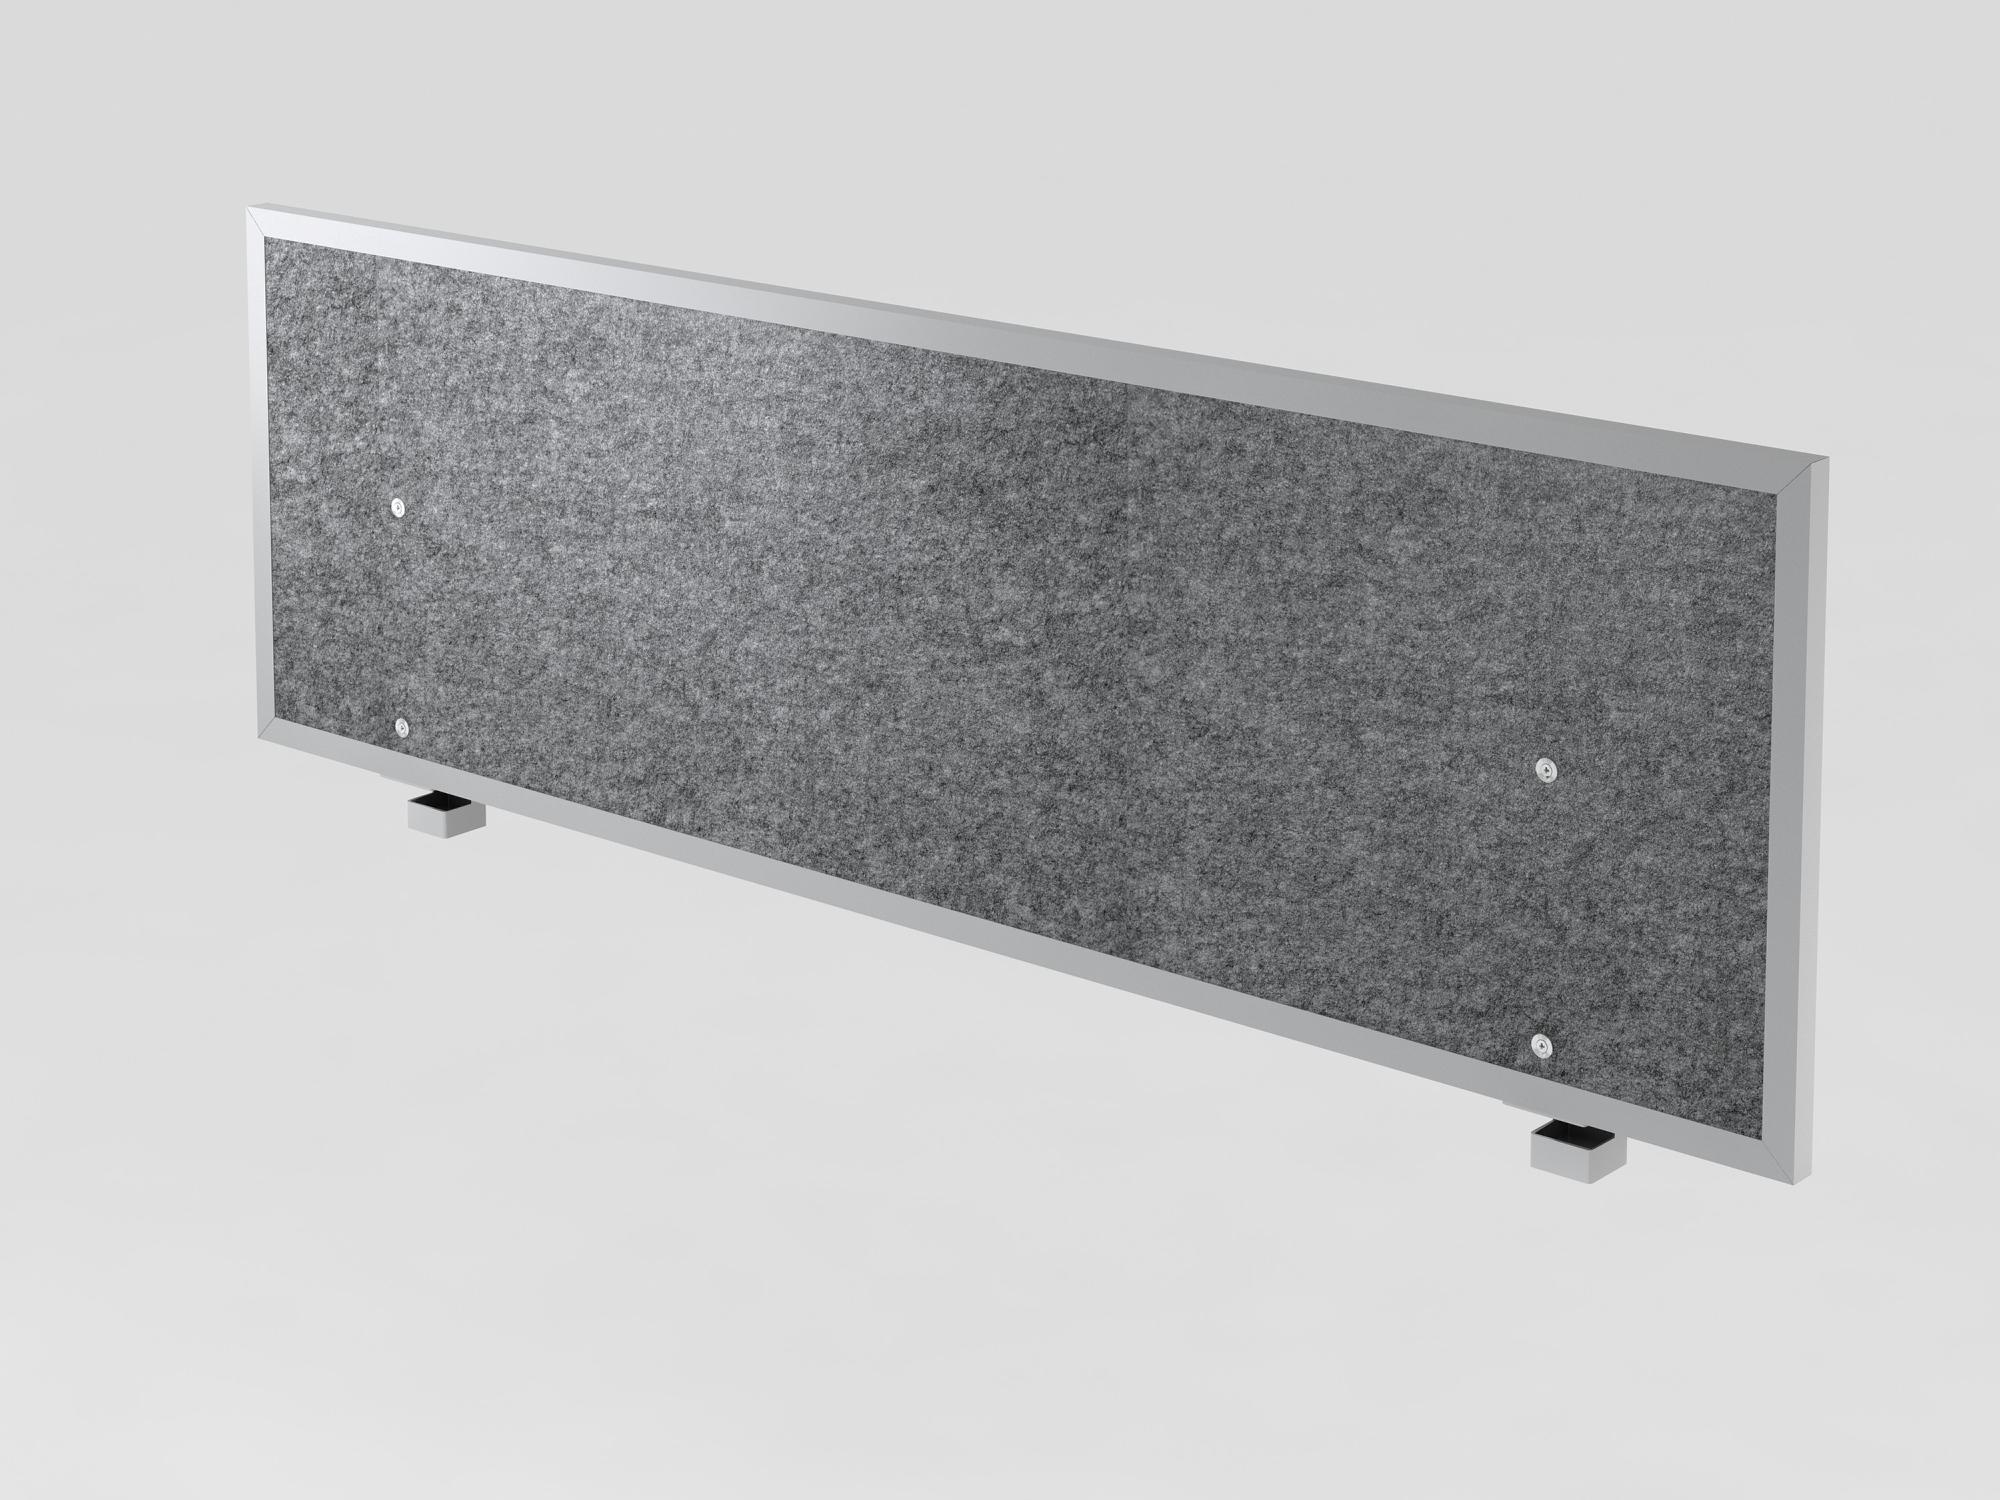 Akustik-Trennwand 160cm, grau-meliert